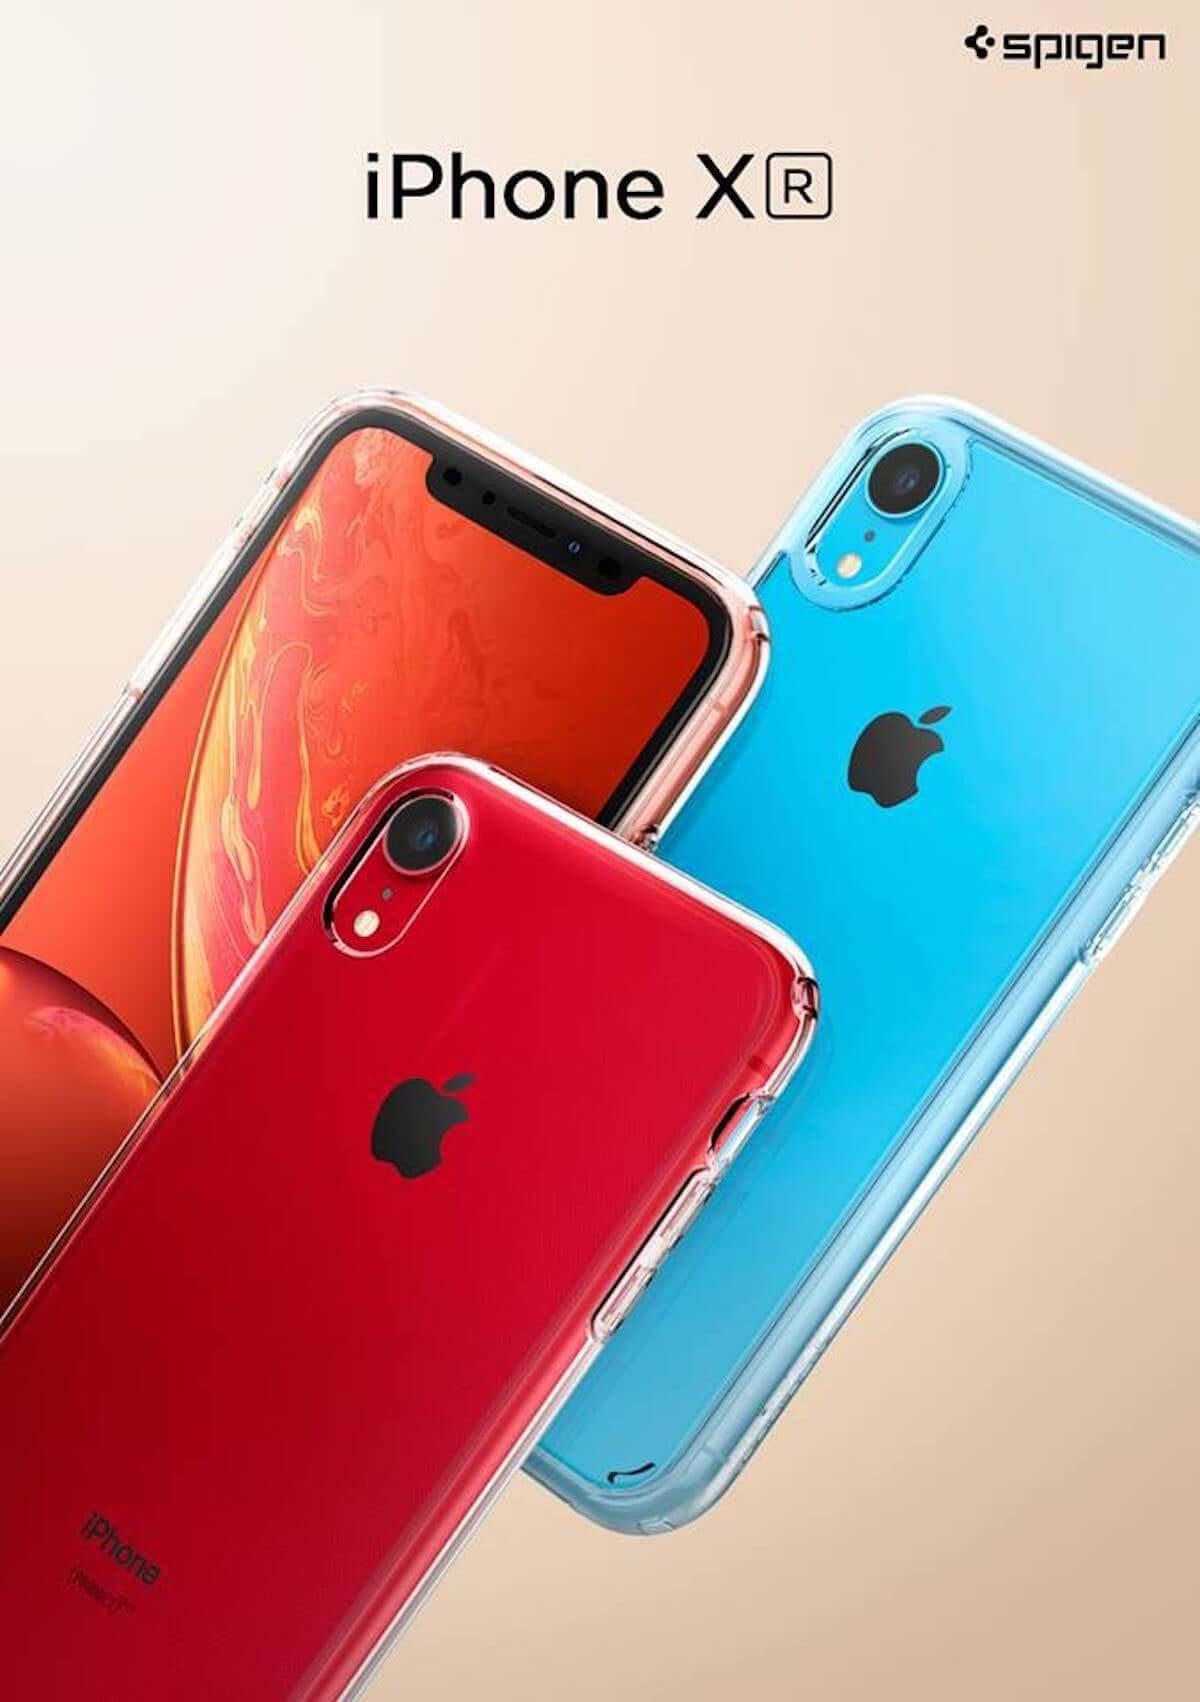 iPhone XRのポップカラーを活かせるクリアケースなどが30%オフ!Spigenが発売記念期間限定セール開催! technology181022_spigen_01-1200x1702